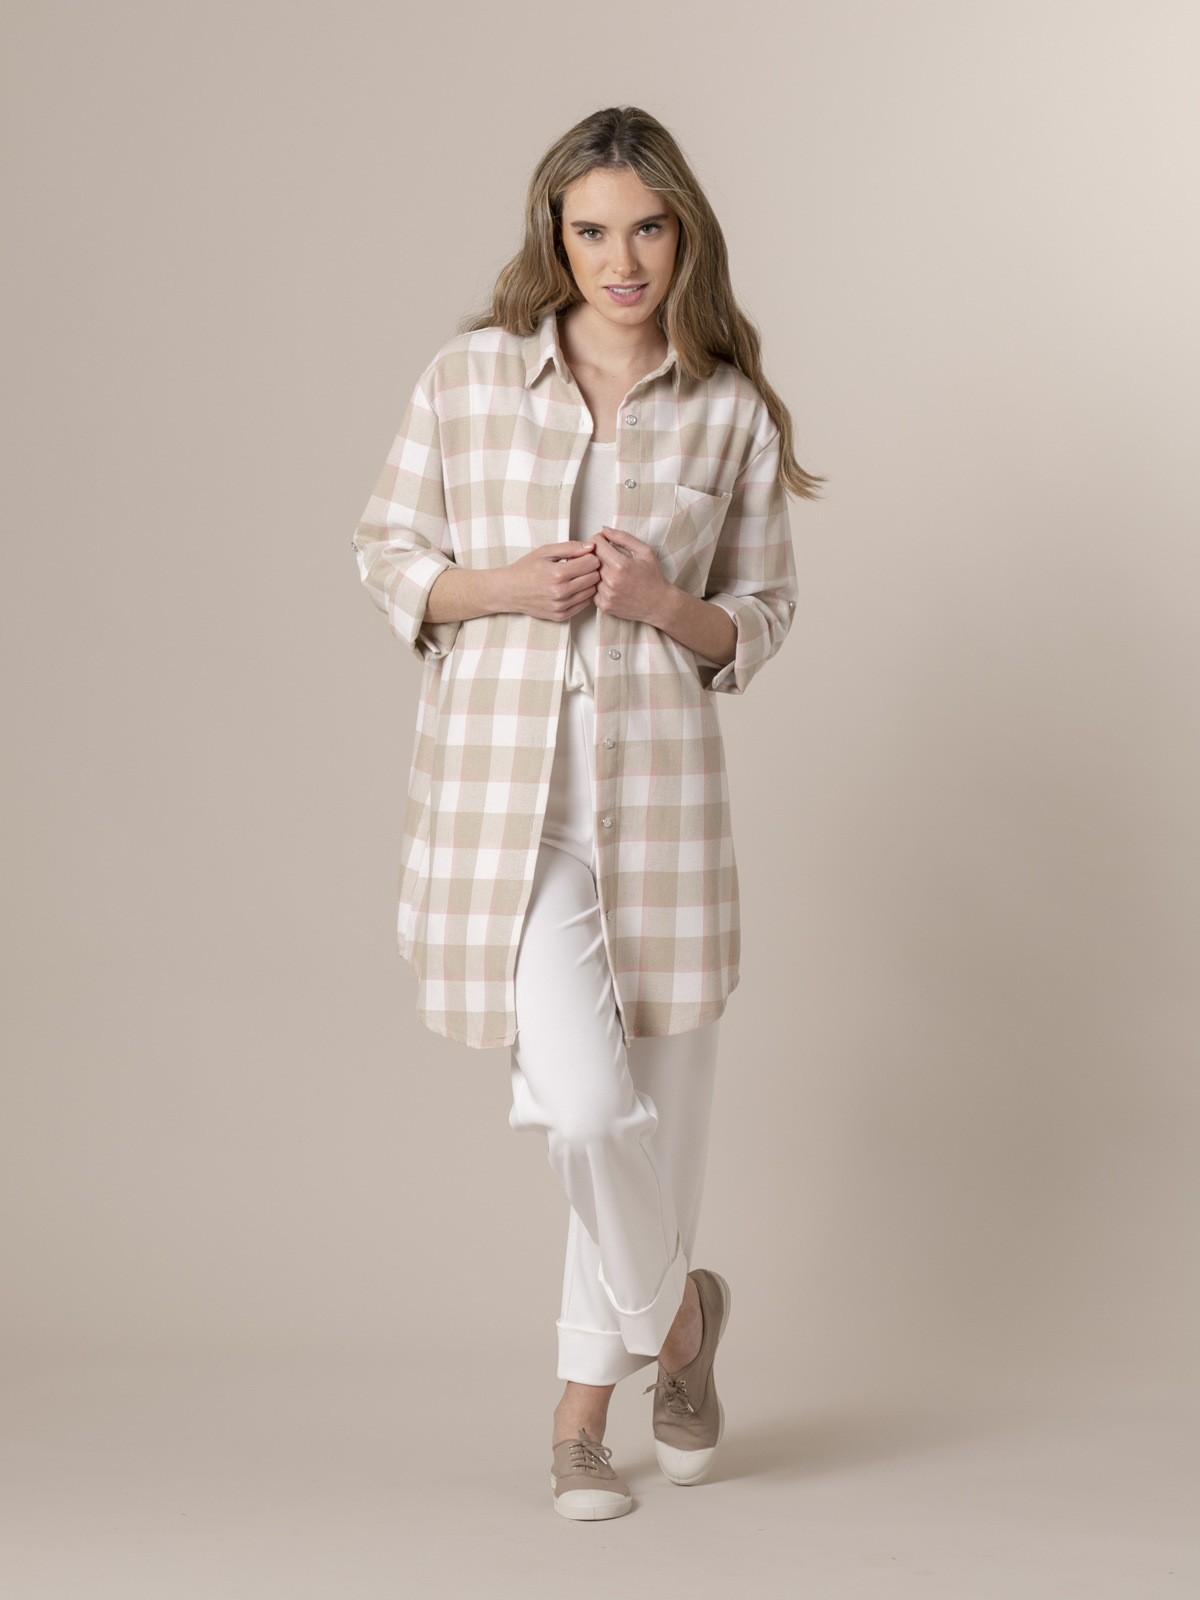 Woman Woman Colorful plaid shirt Beige